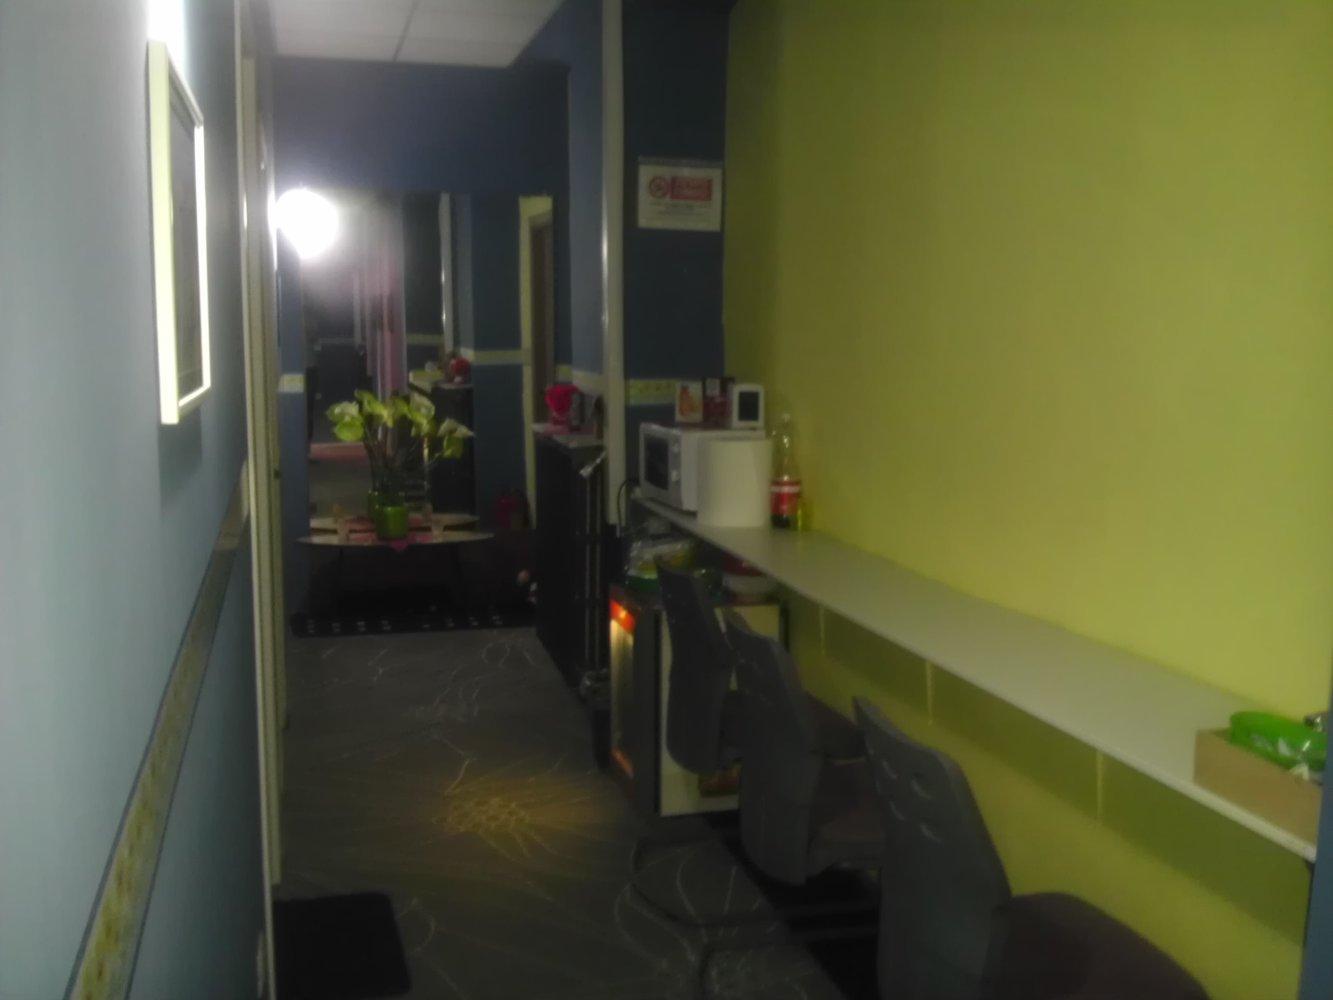 Minas hostel milan italy reviews for Hostel milan